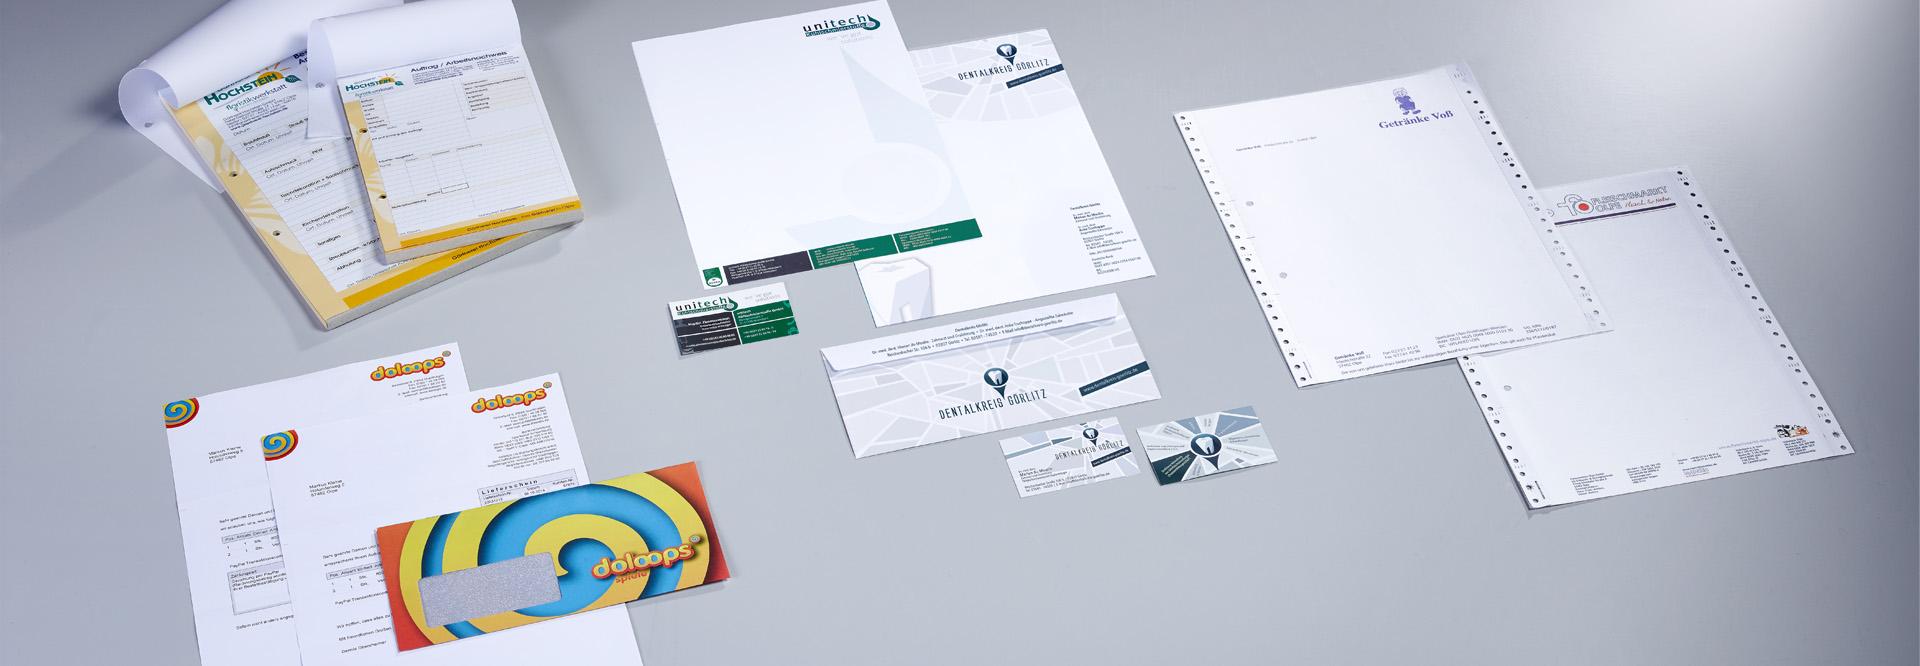 MDK Mediadesign - Werbeagentur in Olpe